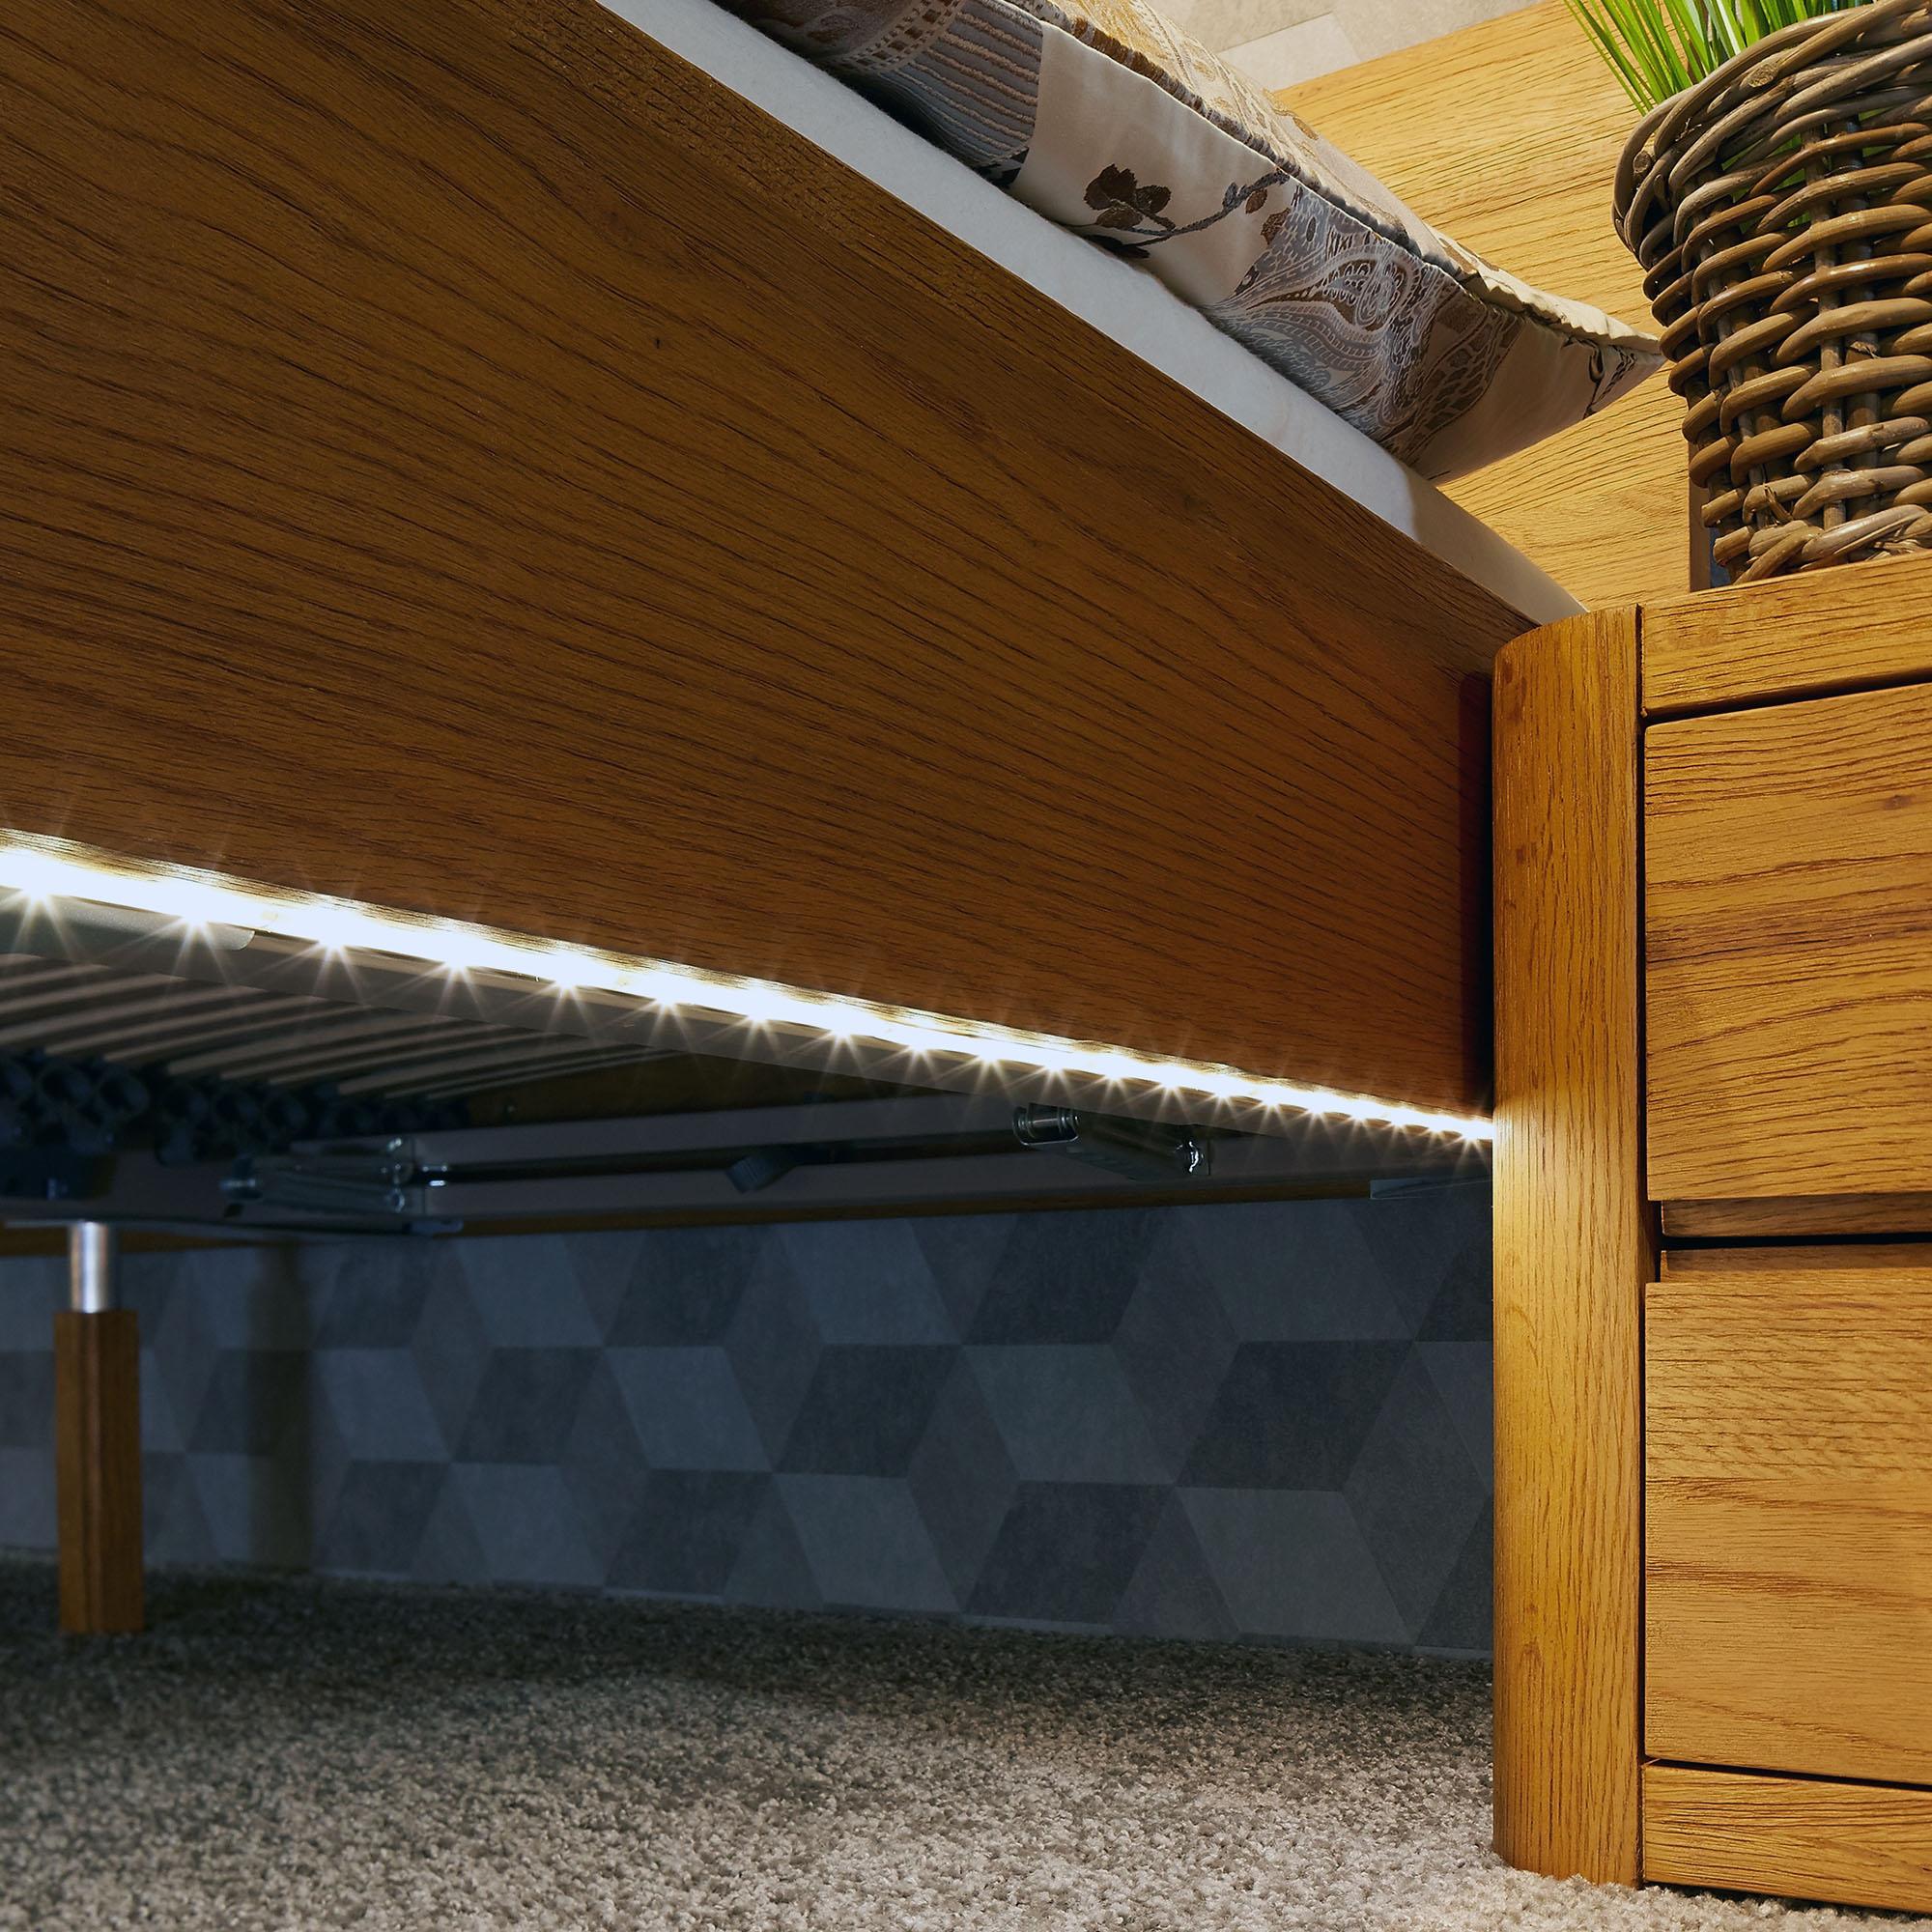 LED Band, 3 Meter, 10 W, Weiß